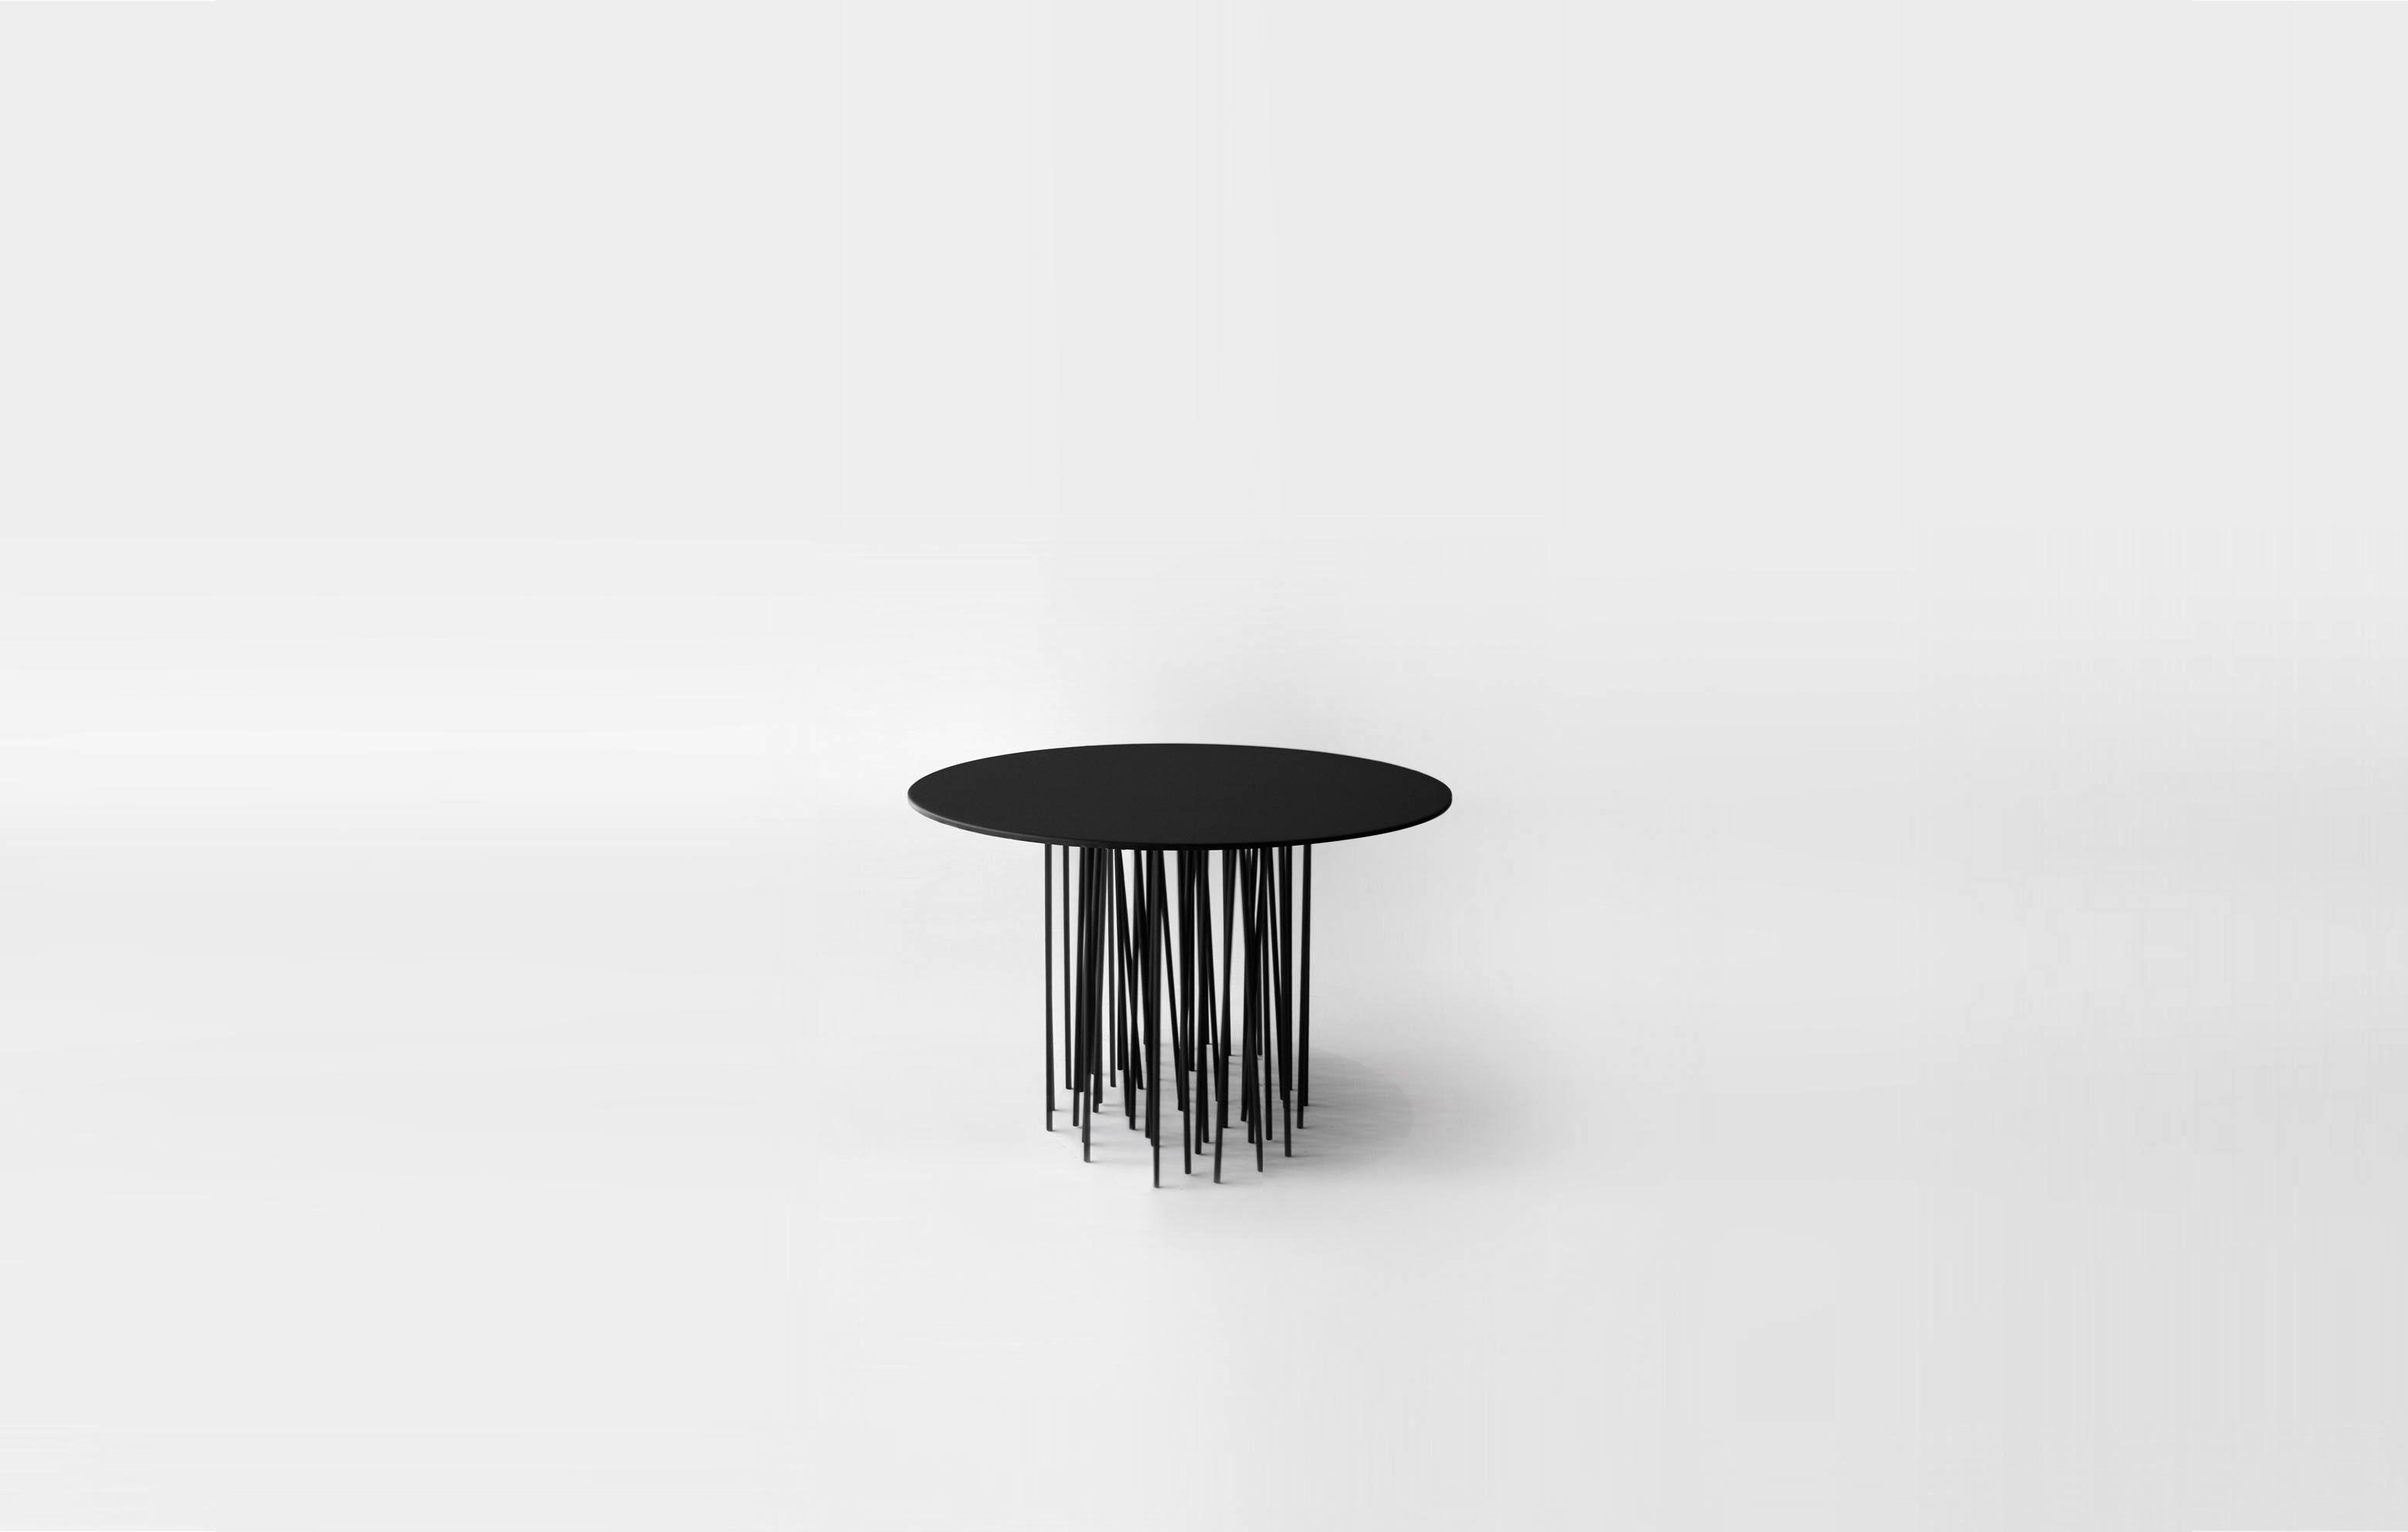 rod side table - nonn